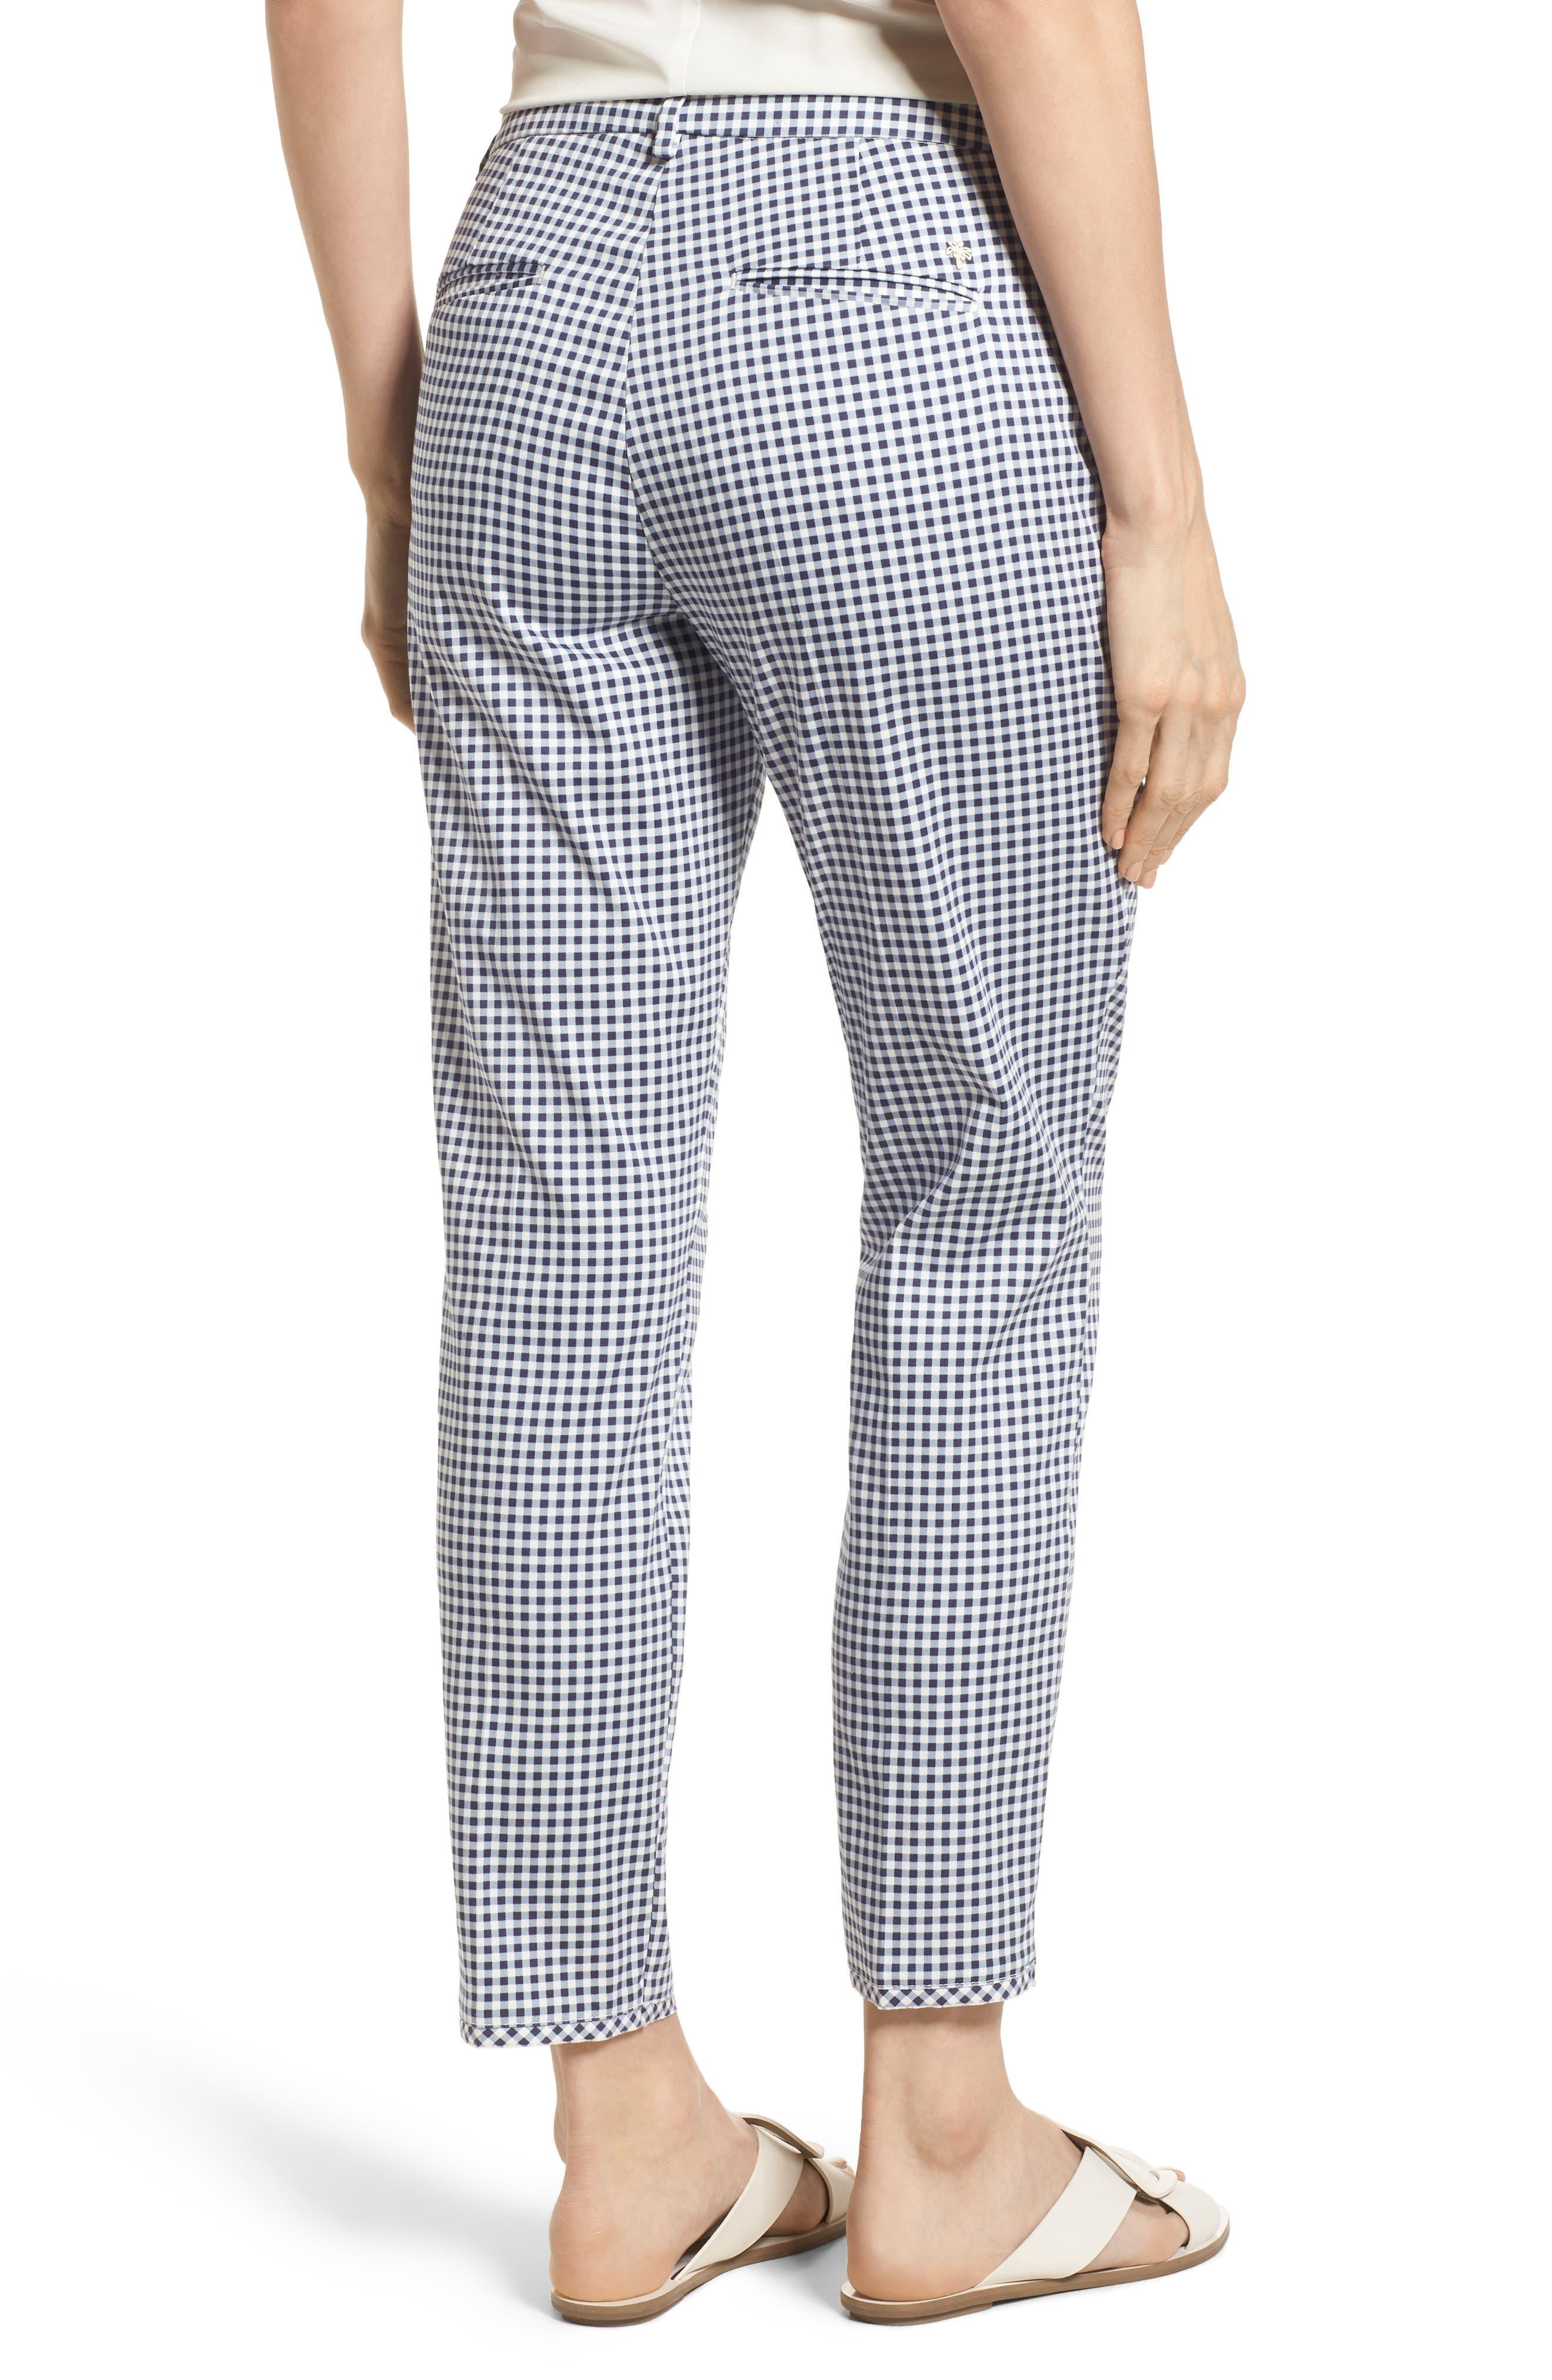 Maron Gingham Stretch Cotton Pants,                             Alternate thumbnail 2, color,                             OCEAN